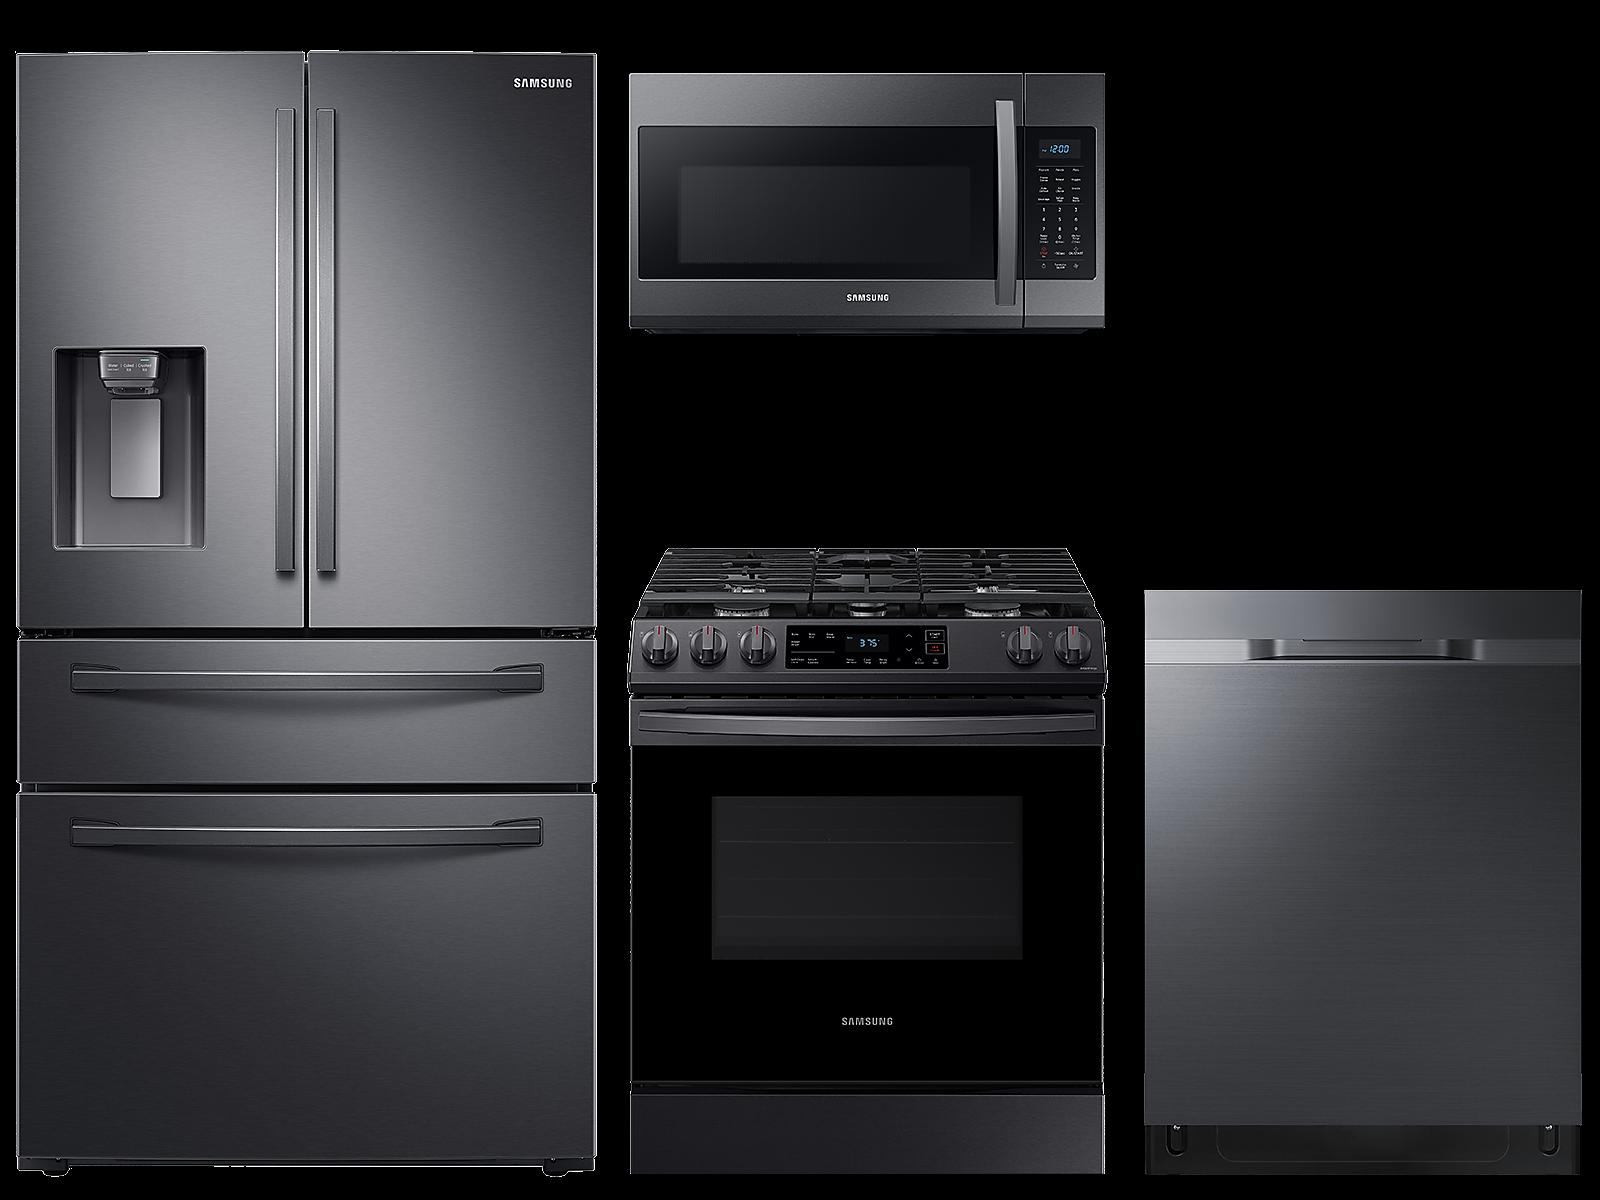 Samsung coupon: Samsung 23 cu. ft. counter depth 4-door refrigerator, gas range, 2.1 cu. ft. microwave and 48 dBA dishwasher package(BNDL-1614028719885)